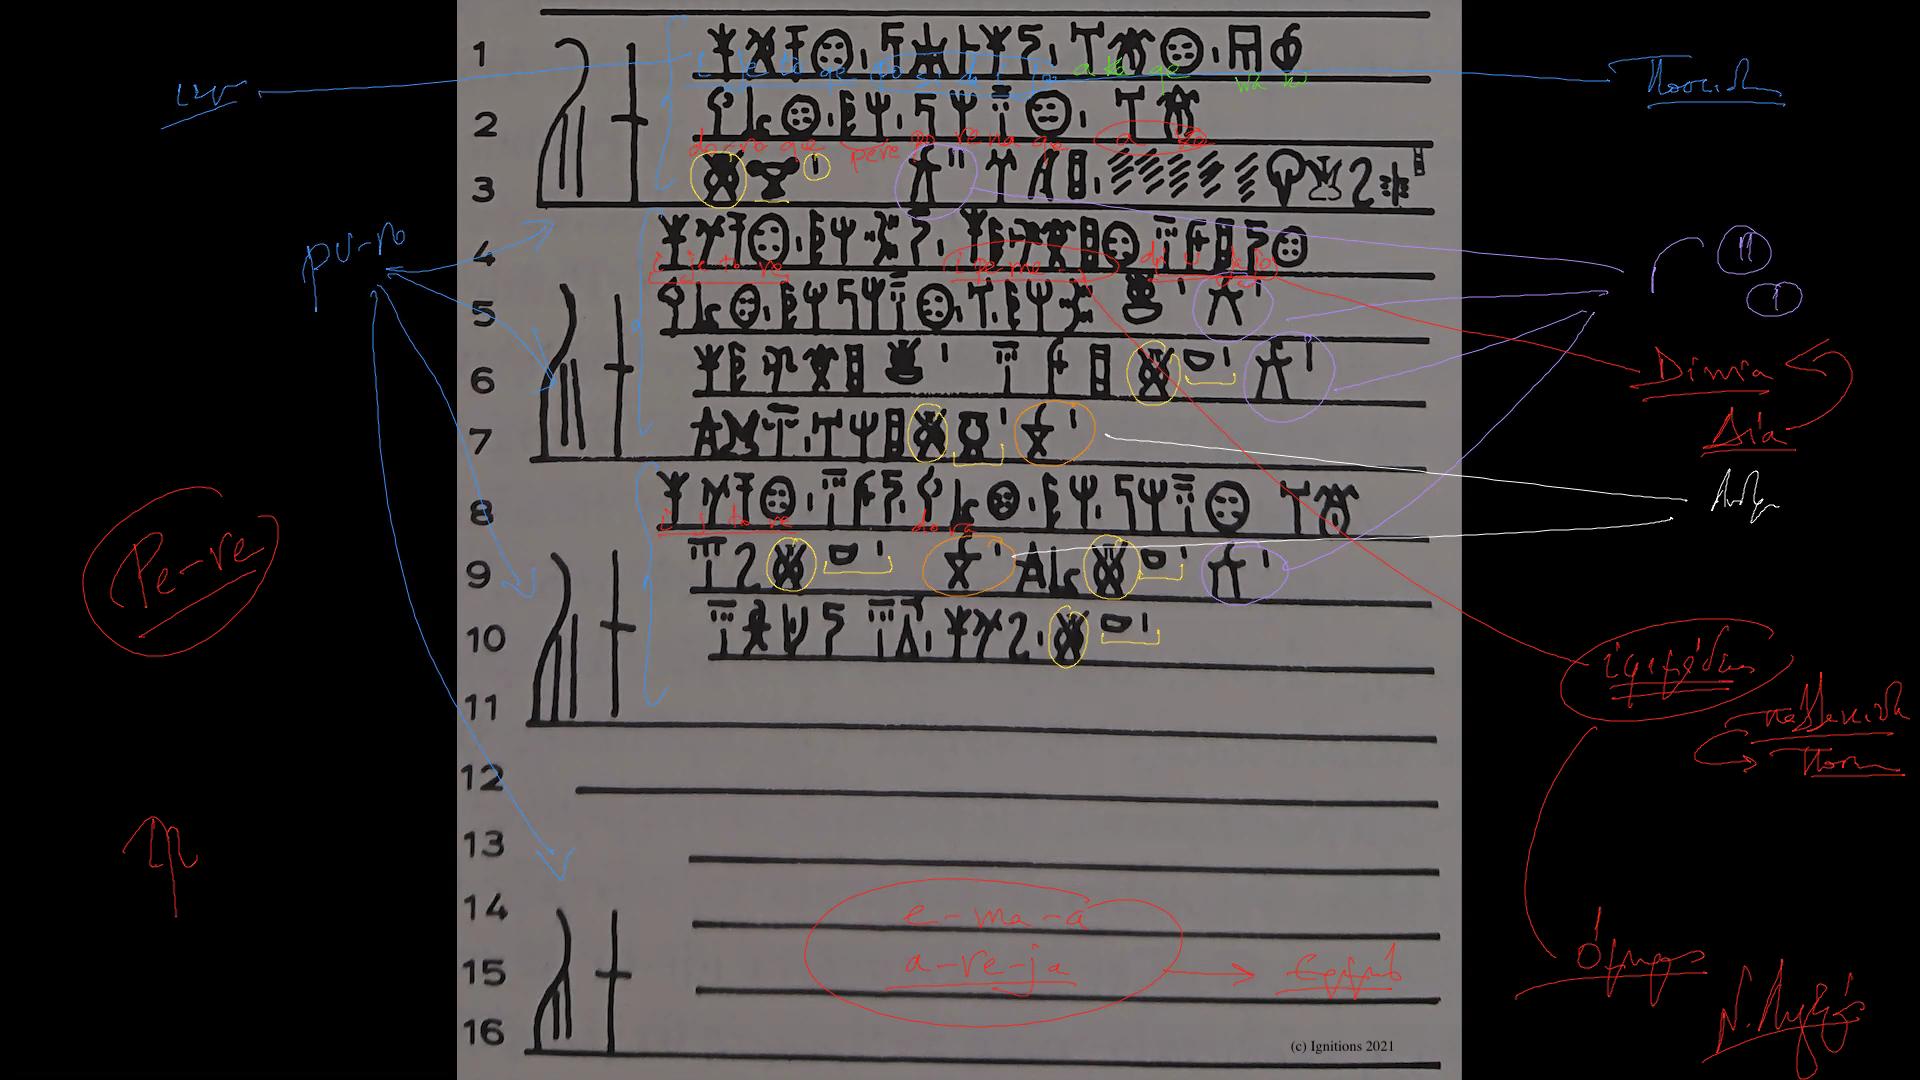 59435 - e-Μάθημα II: Ανάγνωση και ερμηνεία μυκηναϊκής πινακίδας